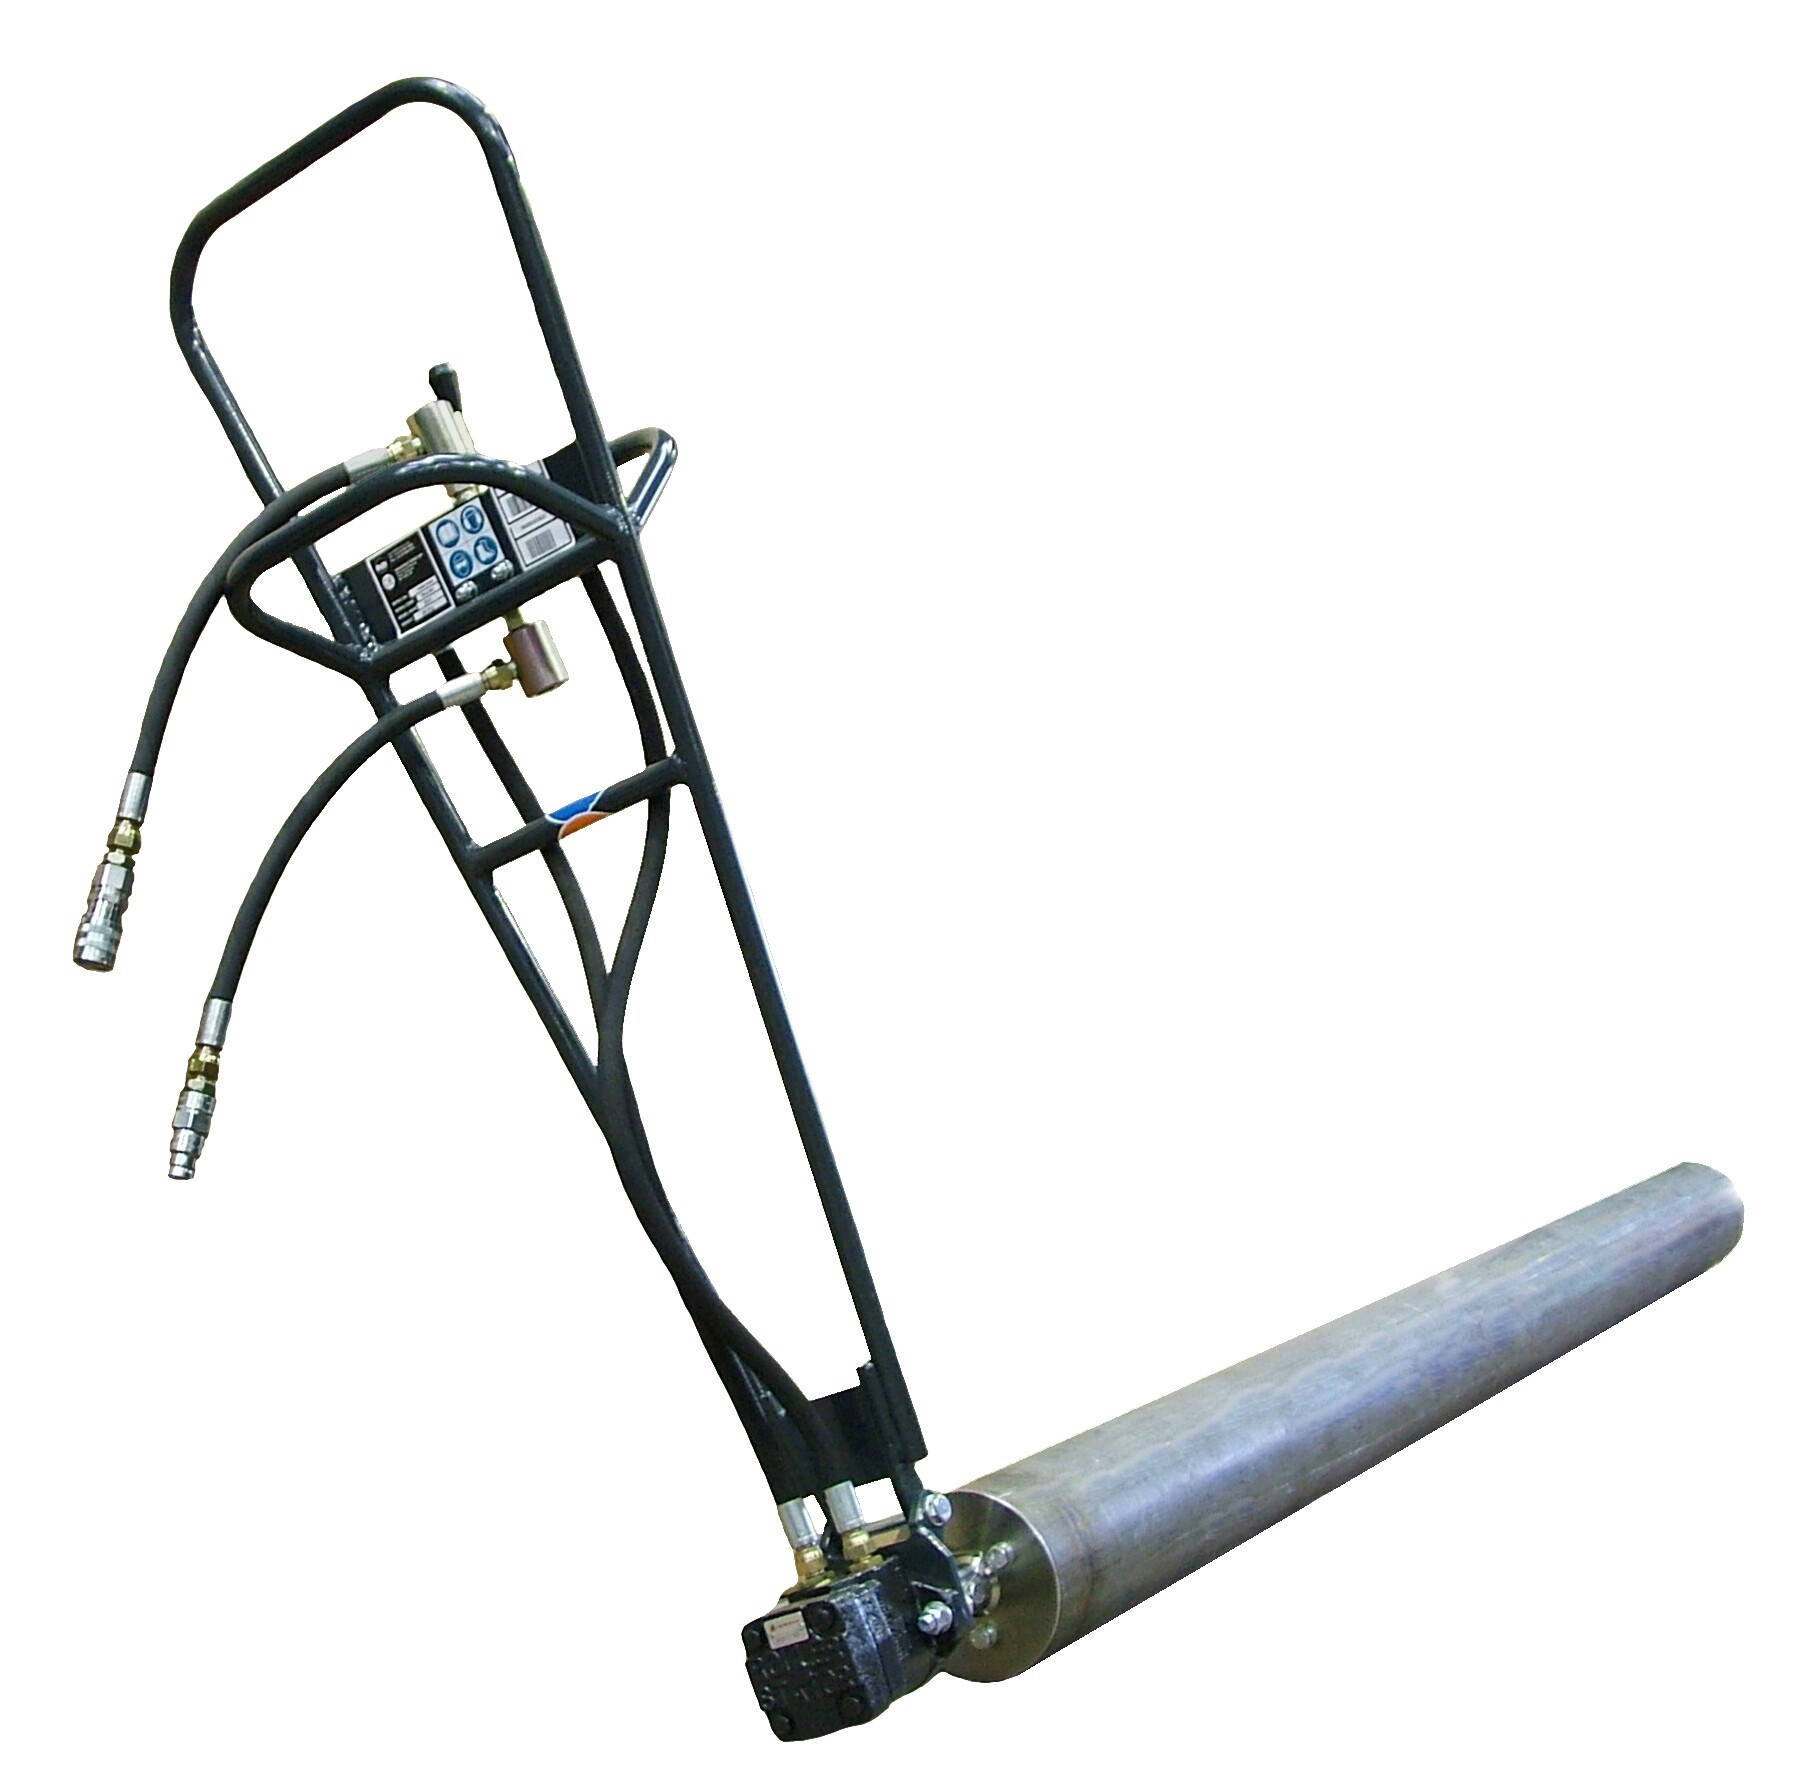 5.2M Roller Striker + Hydraulic Pack